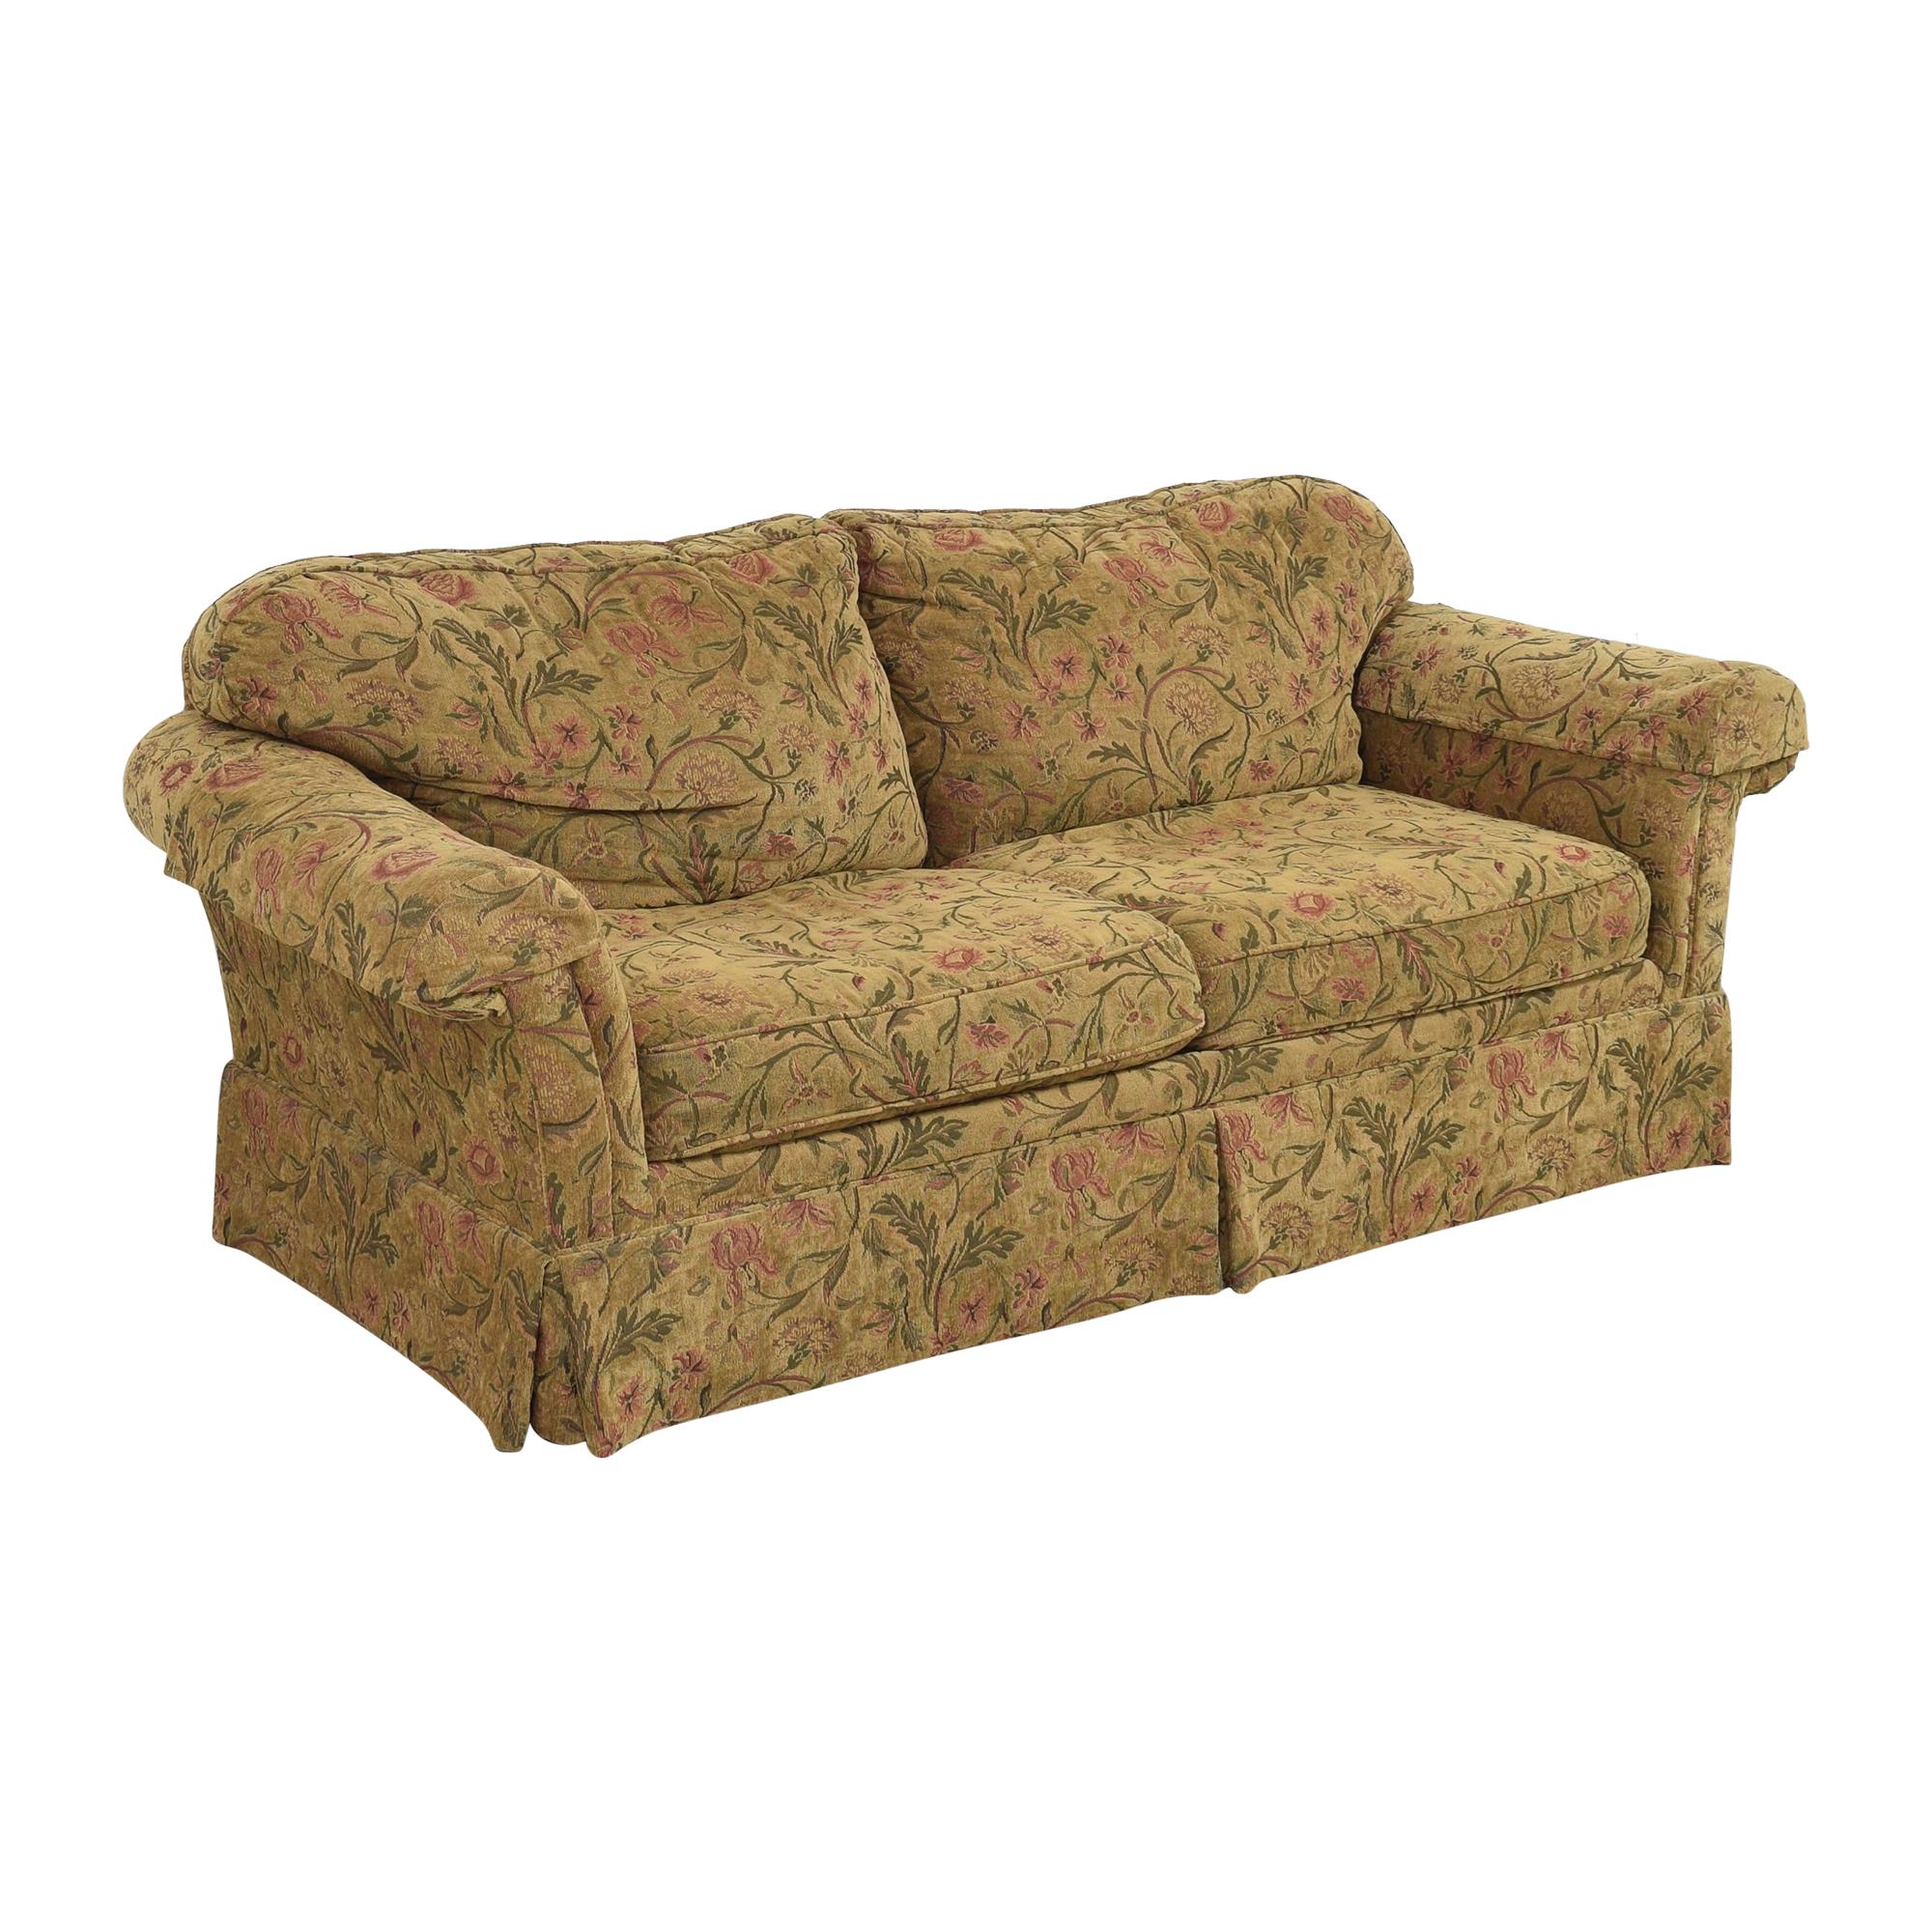 Clayton Marcus Clayton Marcus Skirted Two Cushion Sofa coupon